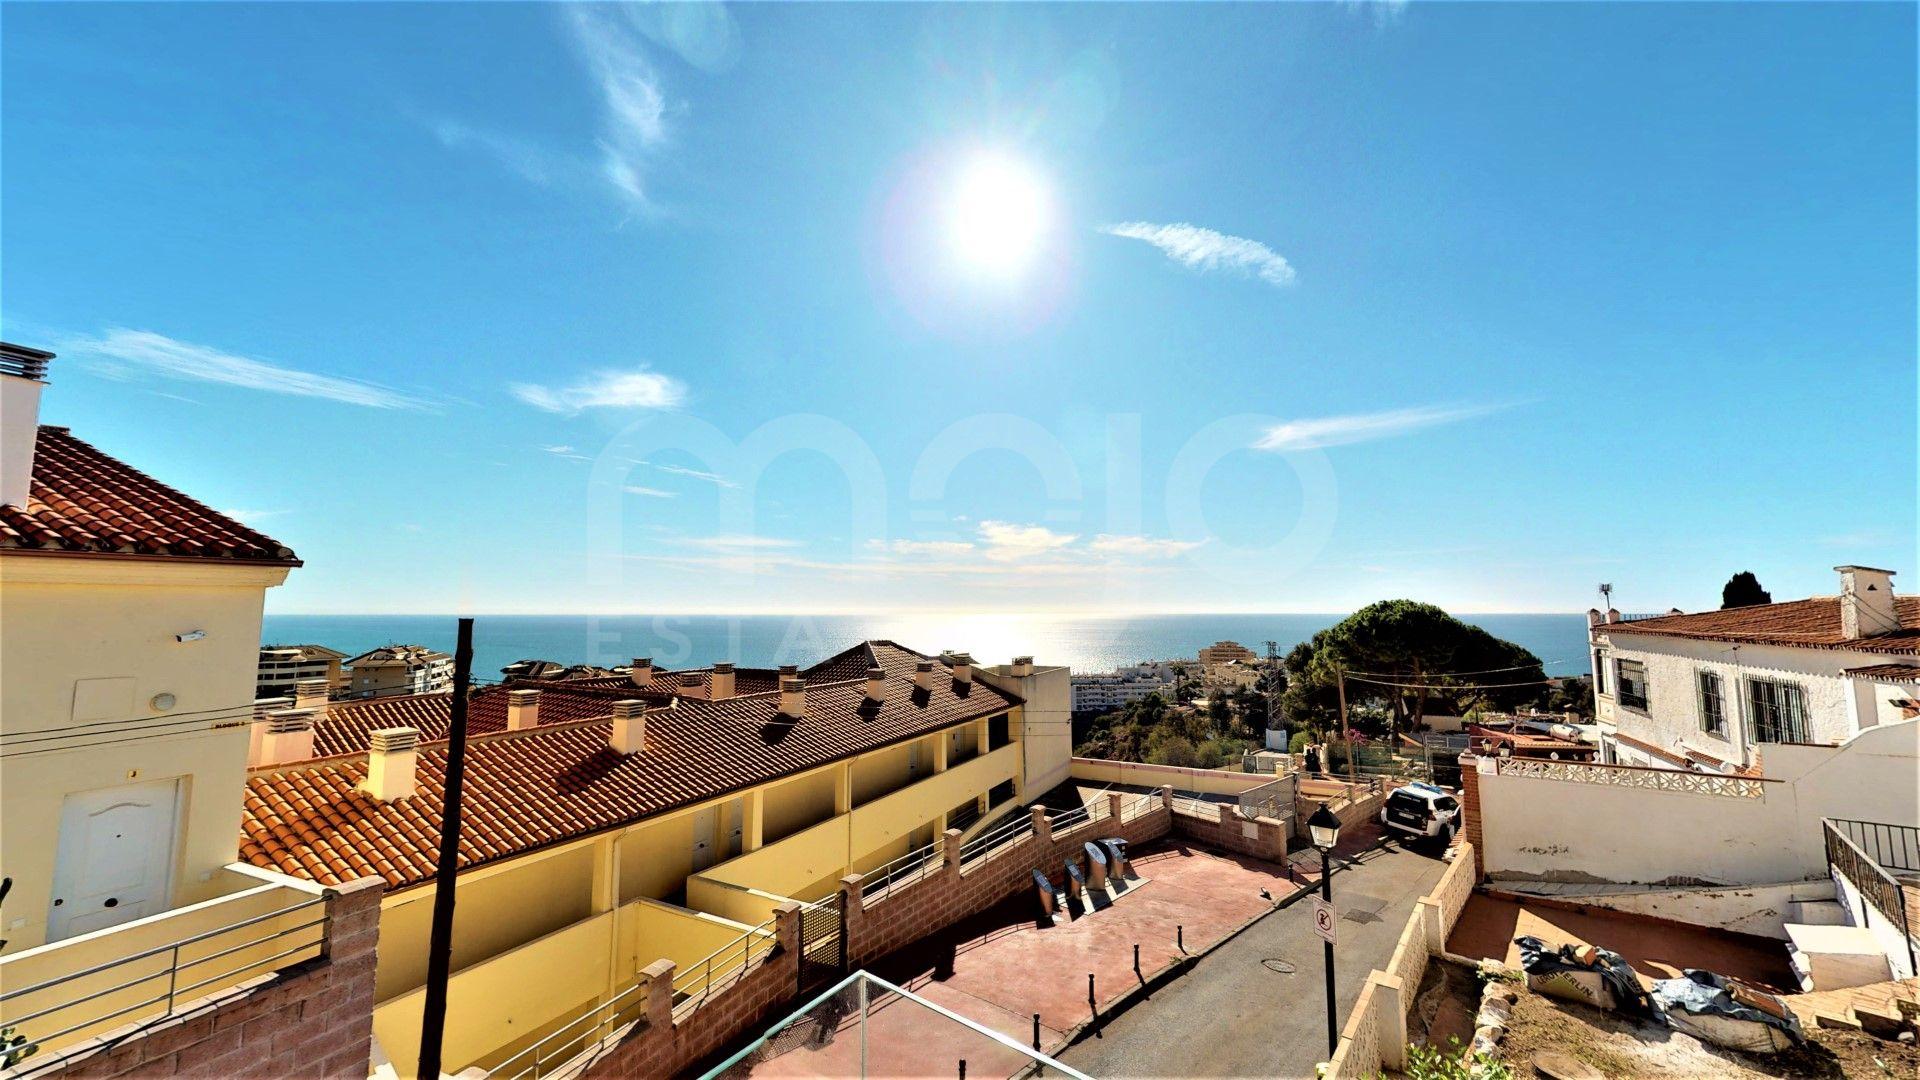 Villa for sale in Torreblanca, Fuengirola